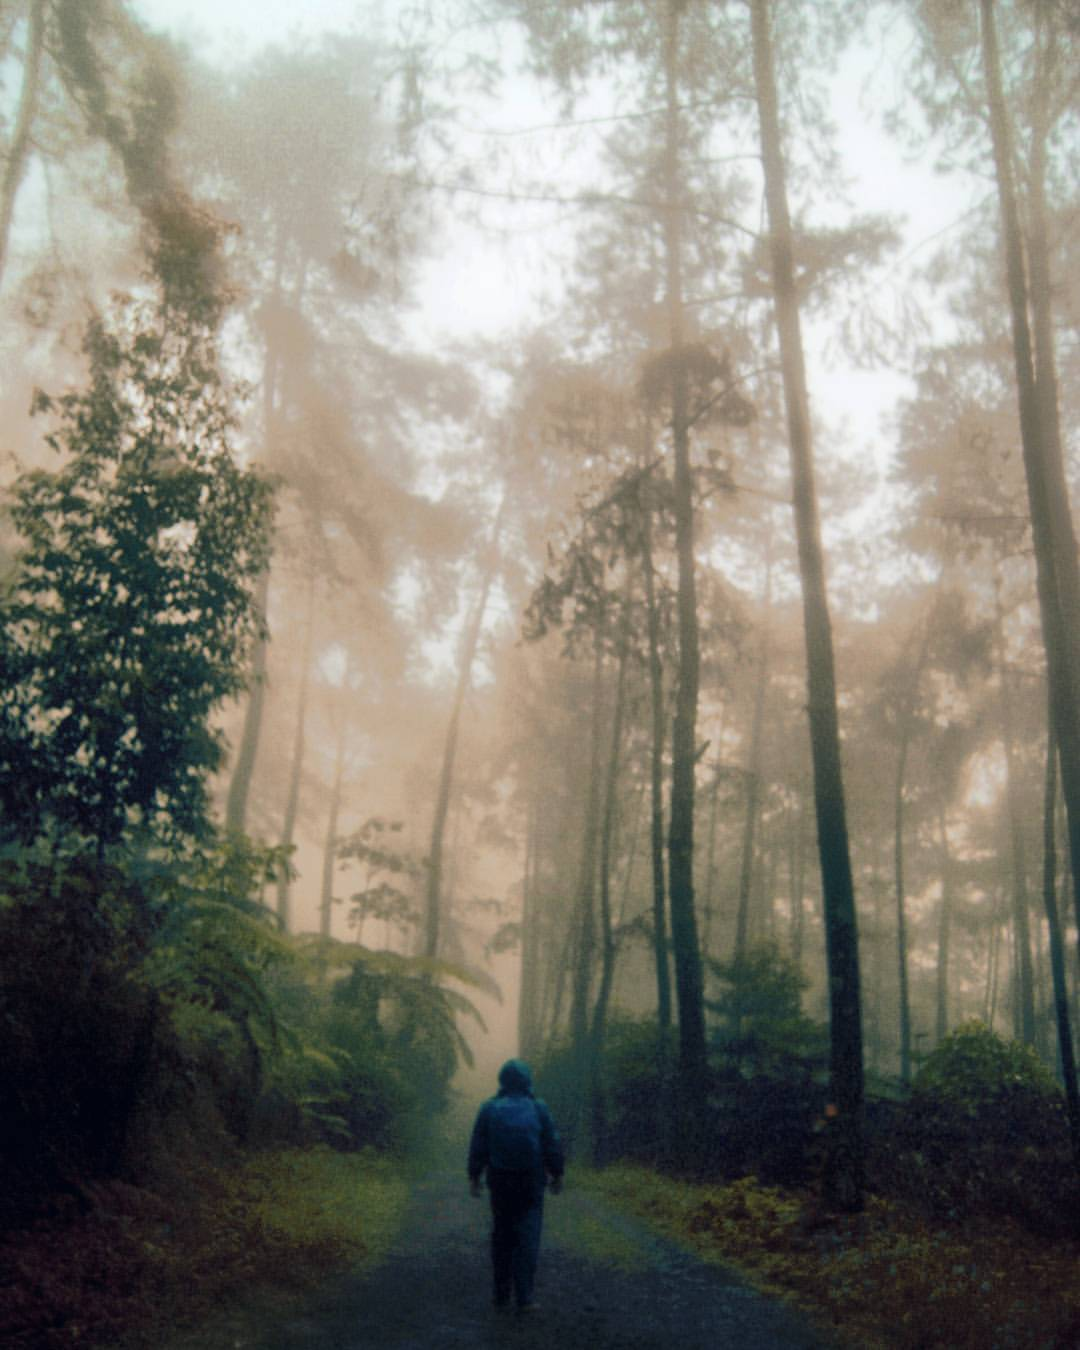 Ardhana Yathesta Aryathesta Instagram Profile Picbear Jungle Watch Bring Knees